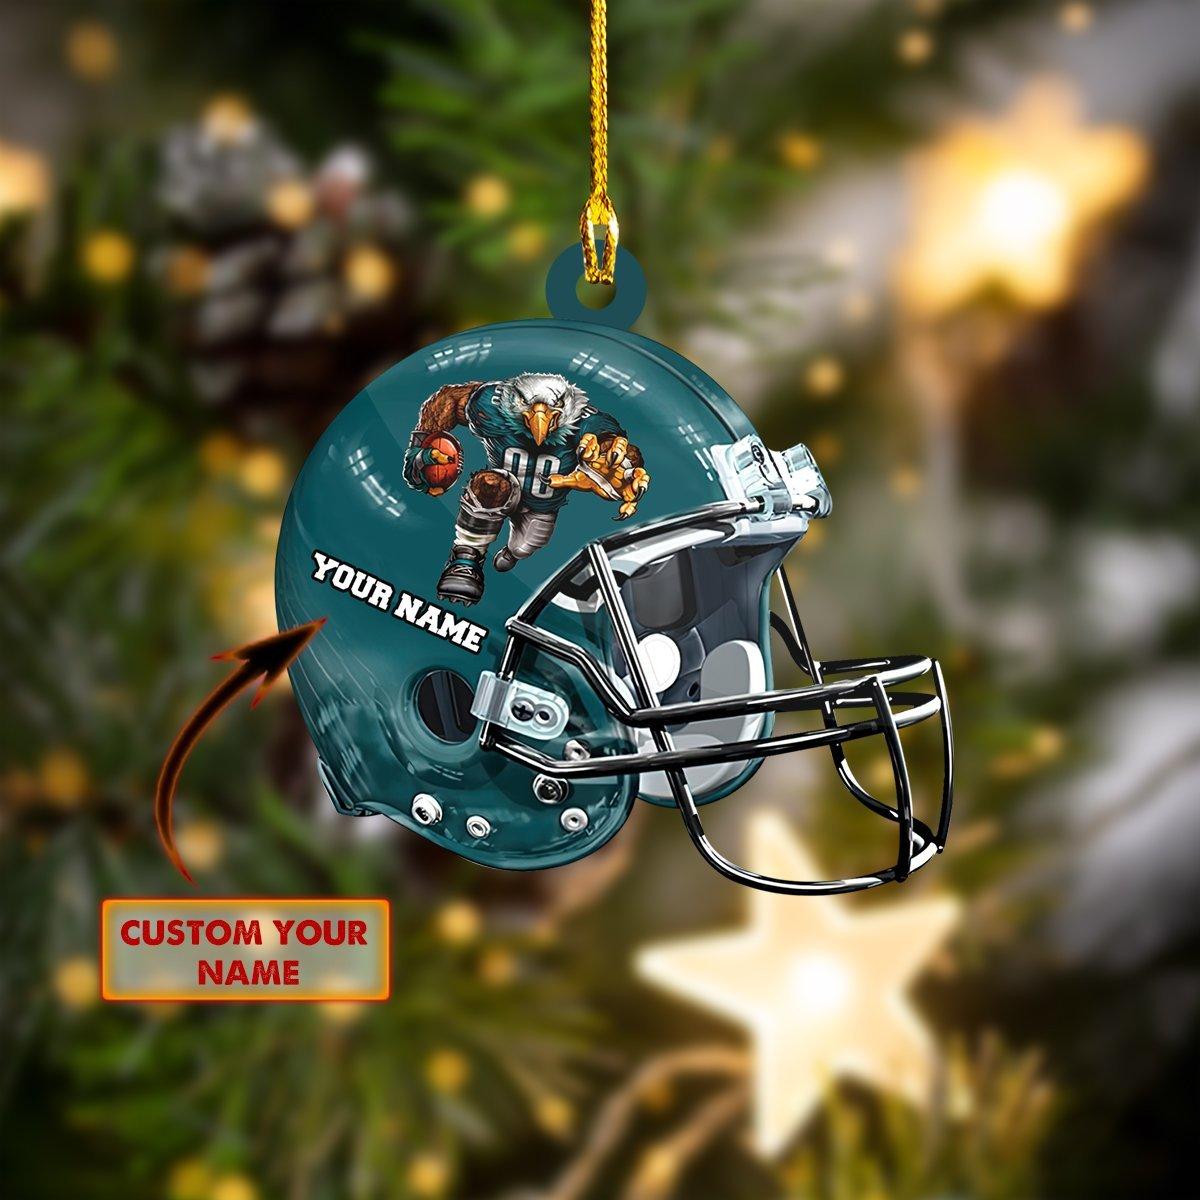 Custom Name Philadelphia Eagle Nfl Christmas Ornament